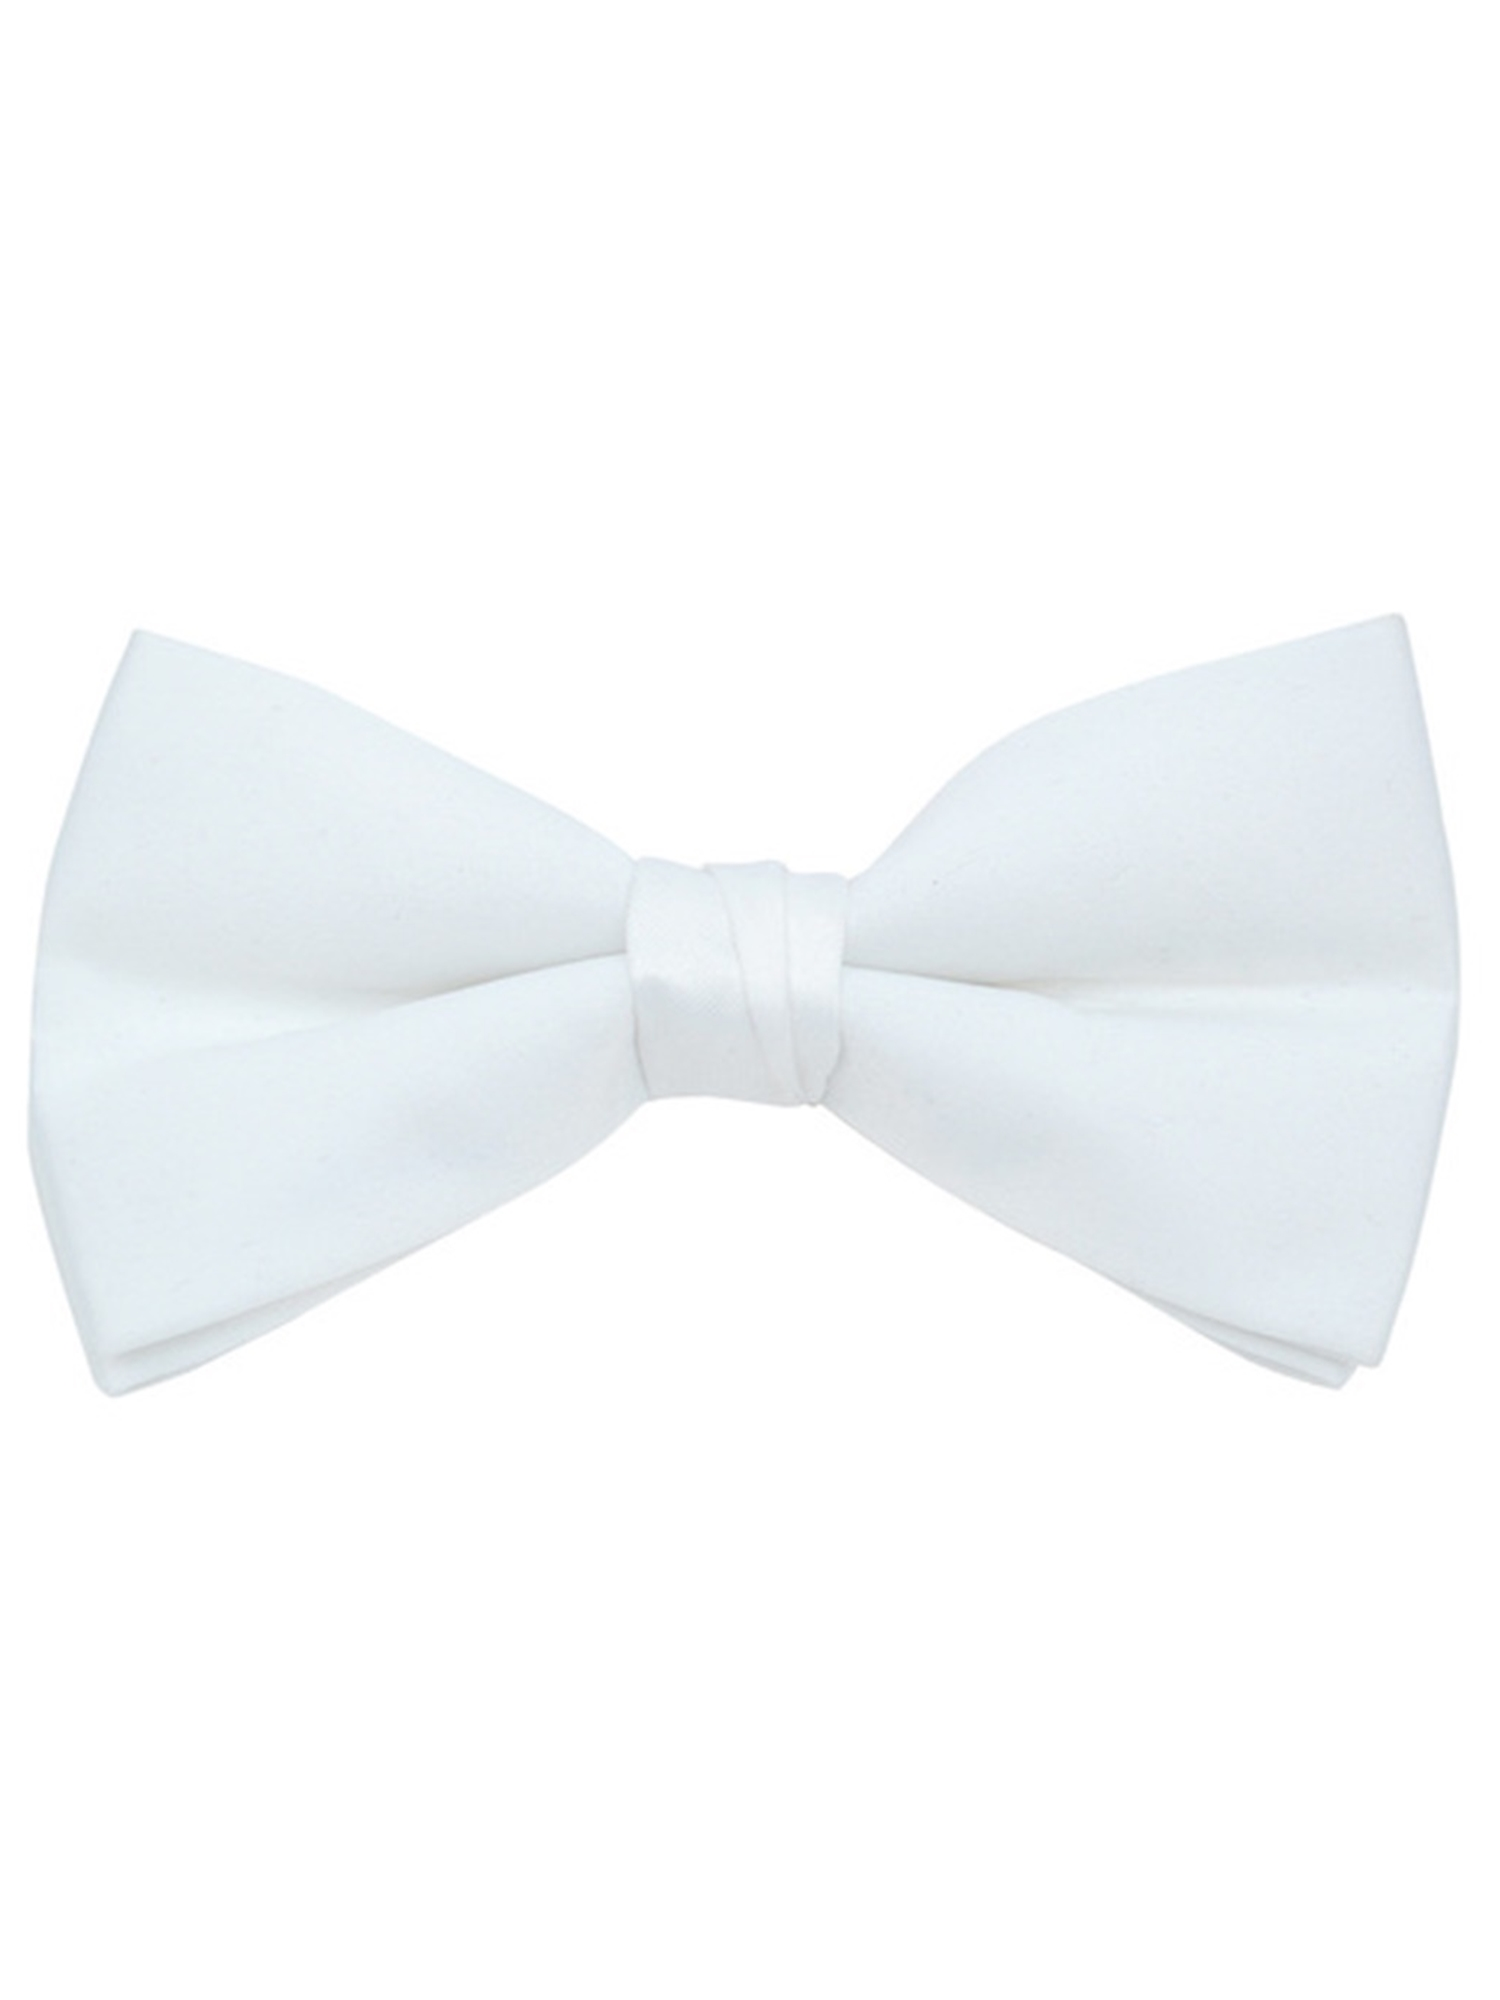 New in box men/'s pre-tied bowtie 100/% silk gray solid formal wedding prom